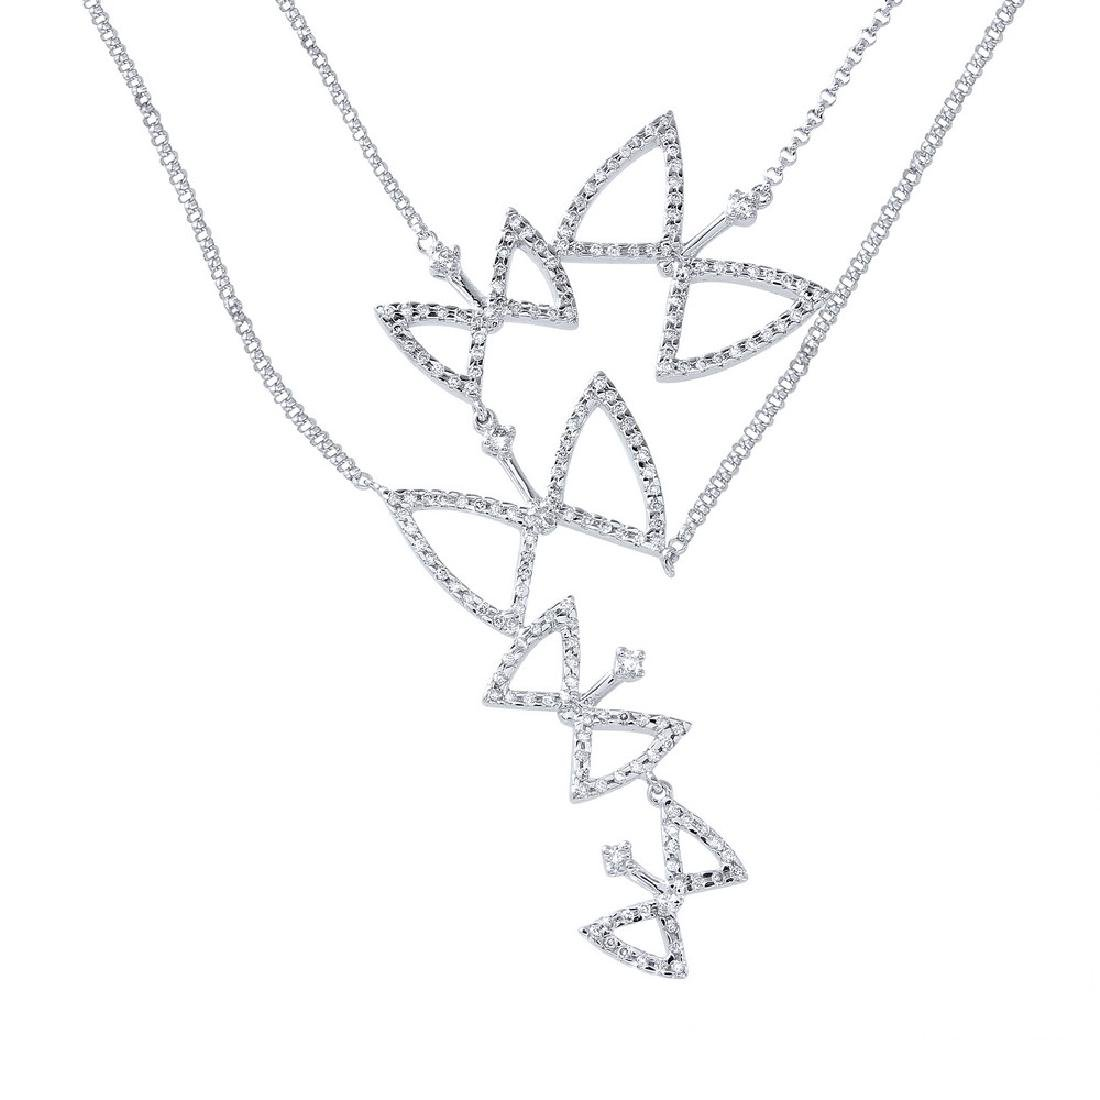 Genuine 1.07 TCW 14K White Gold Ladies Necklace